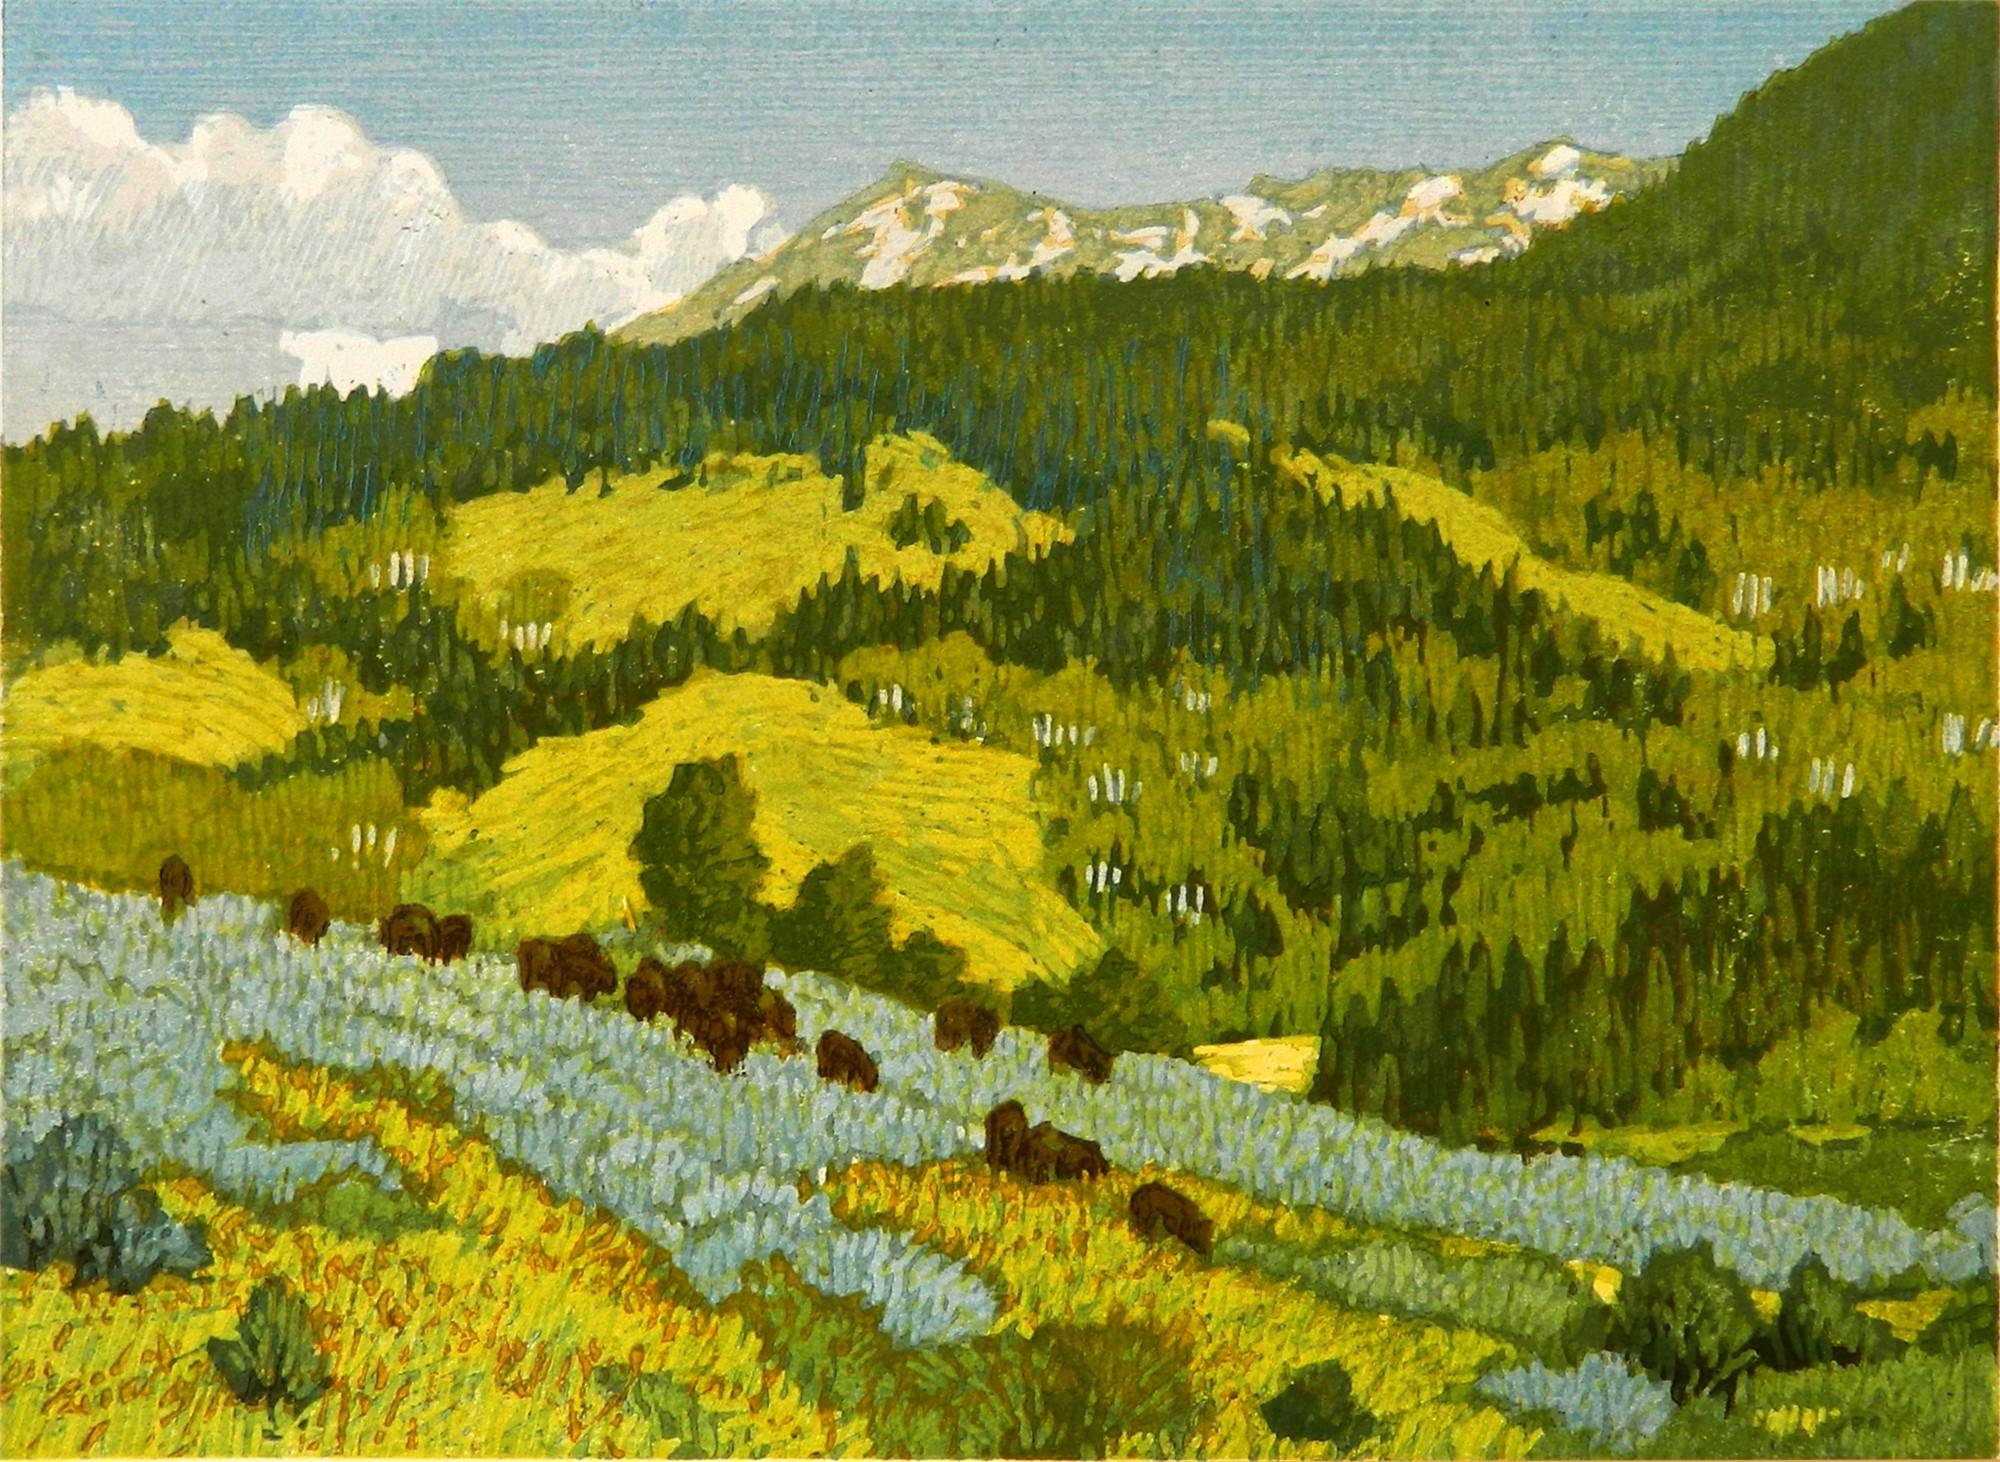 Summer Pasture by Leon Loughridge